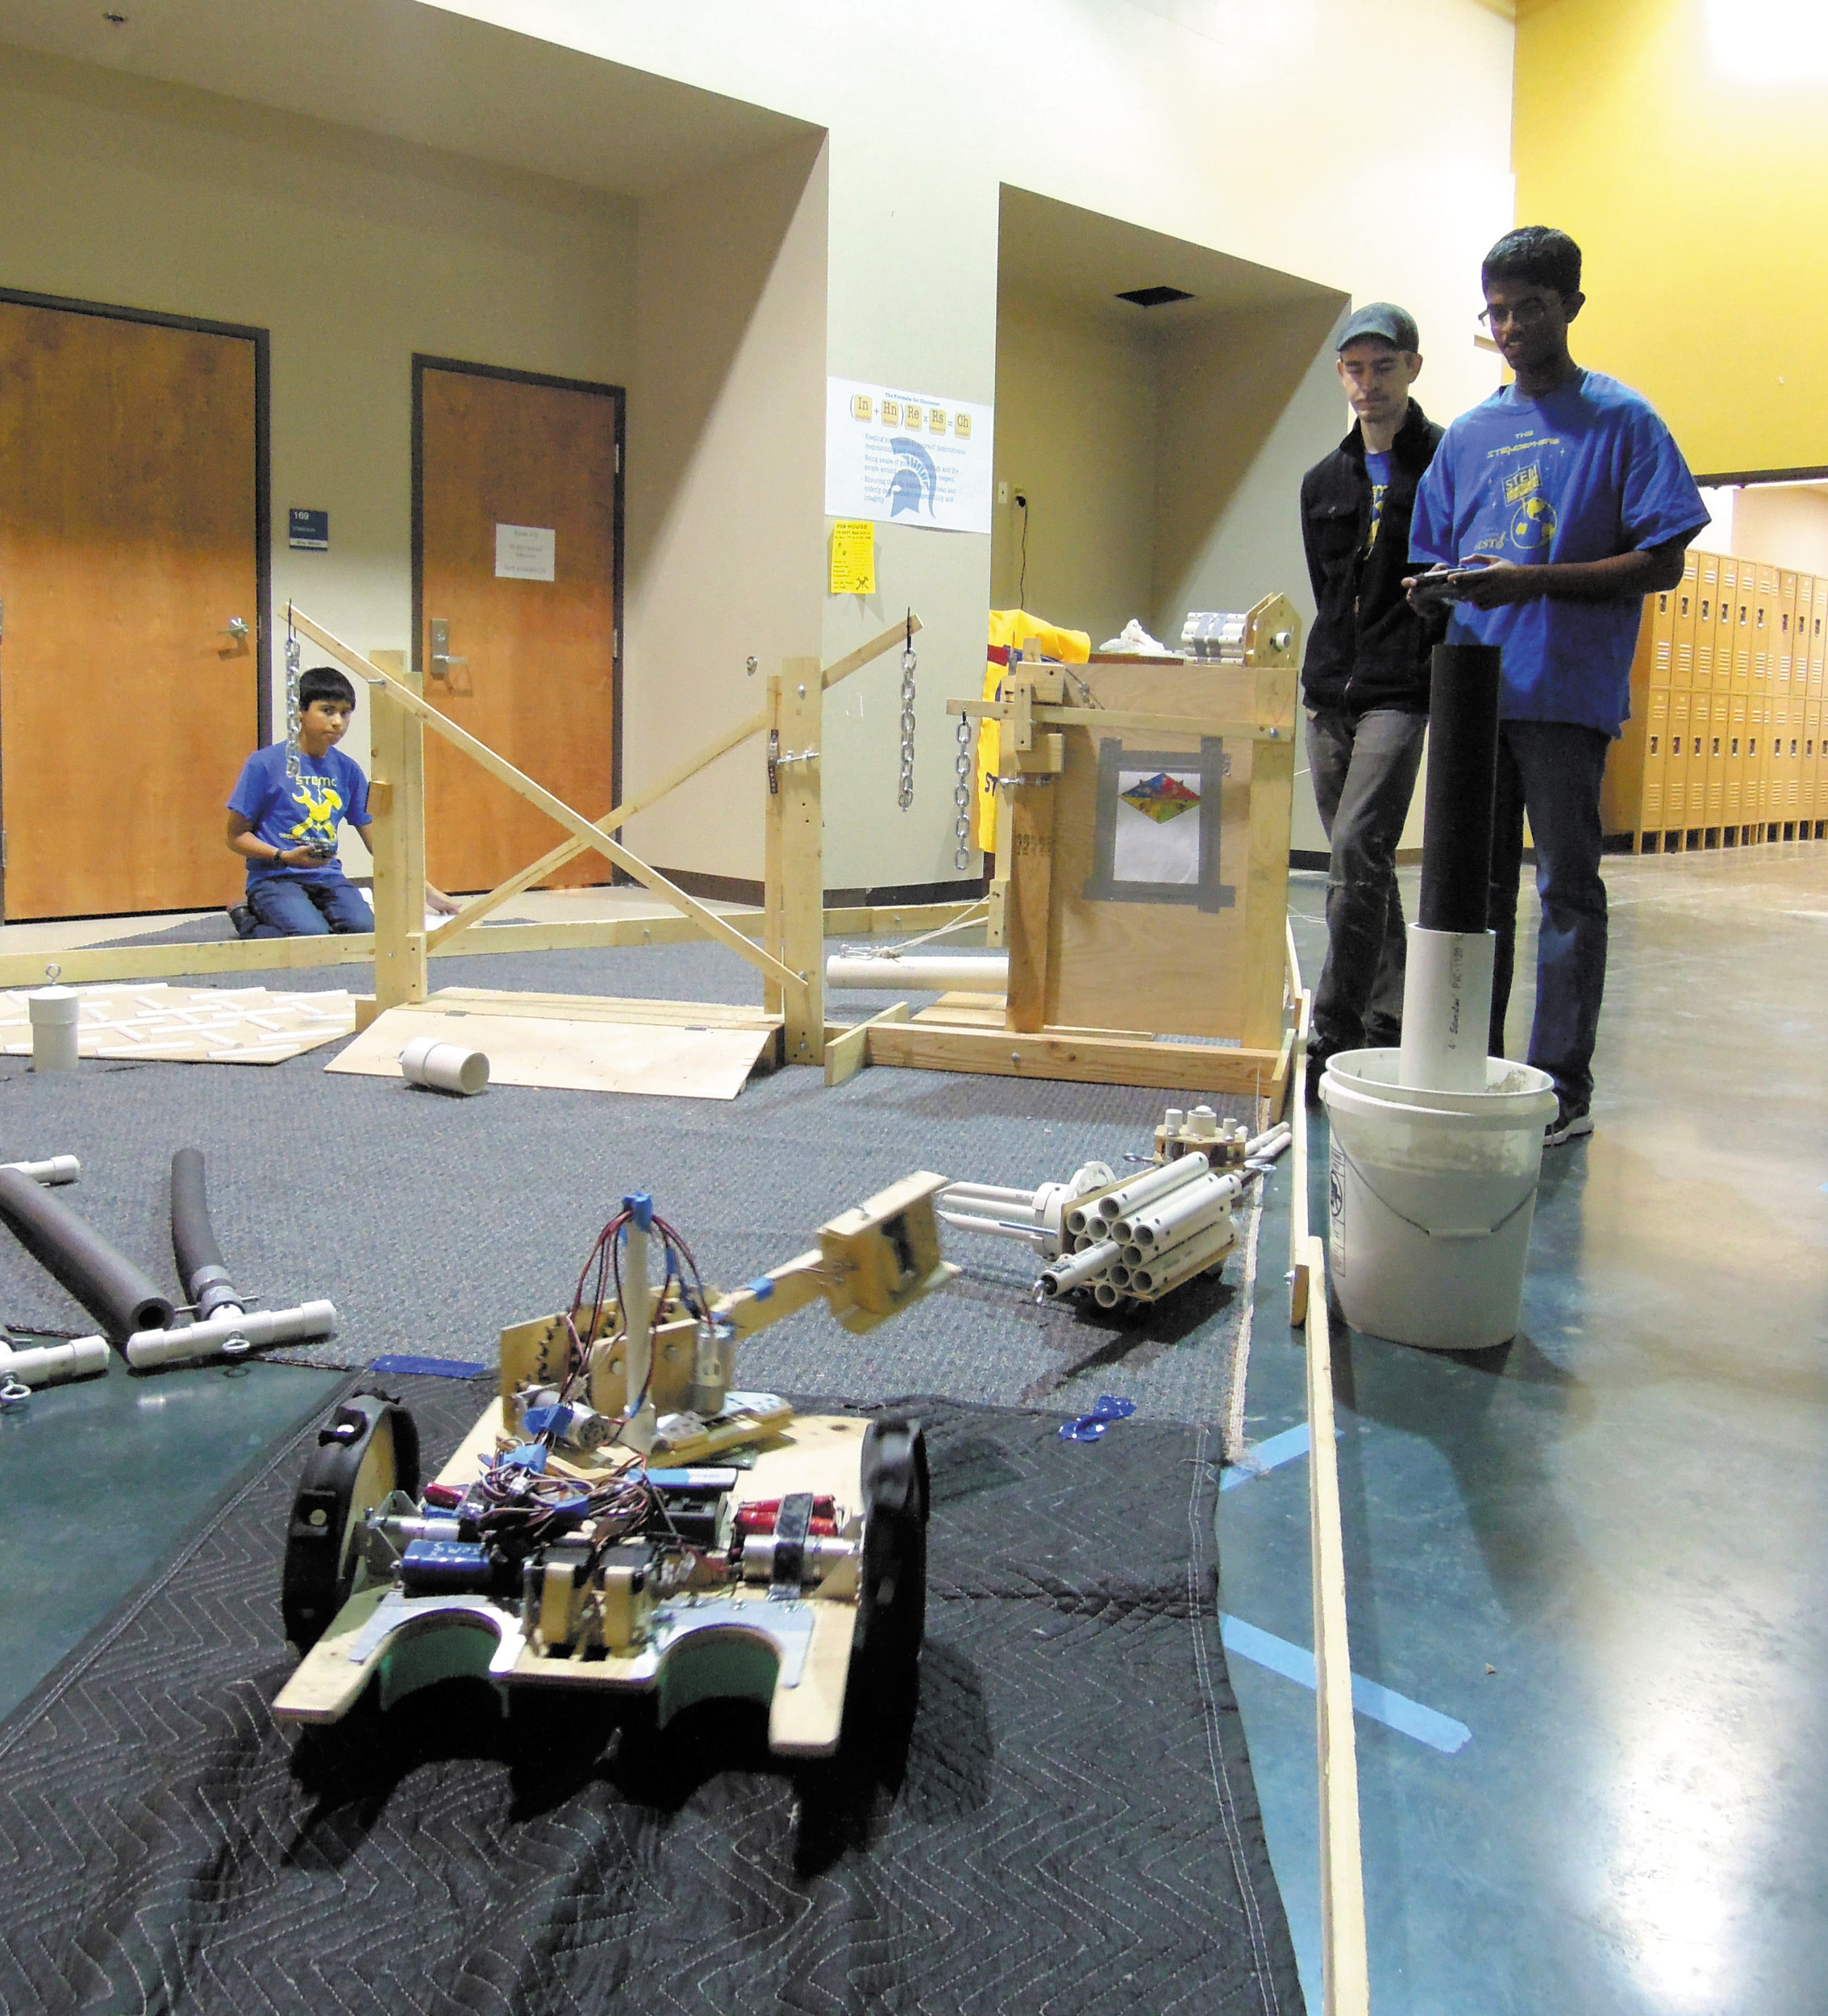 Stem School Highlands Ranch: A Robot Built Above The Pecking Order